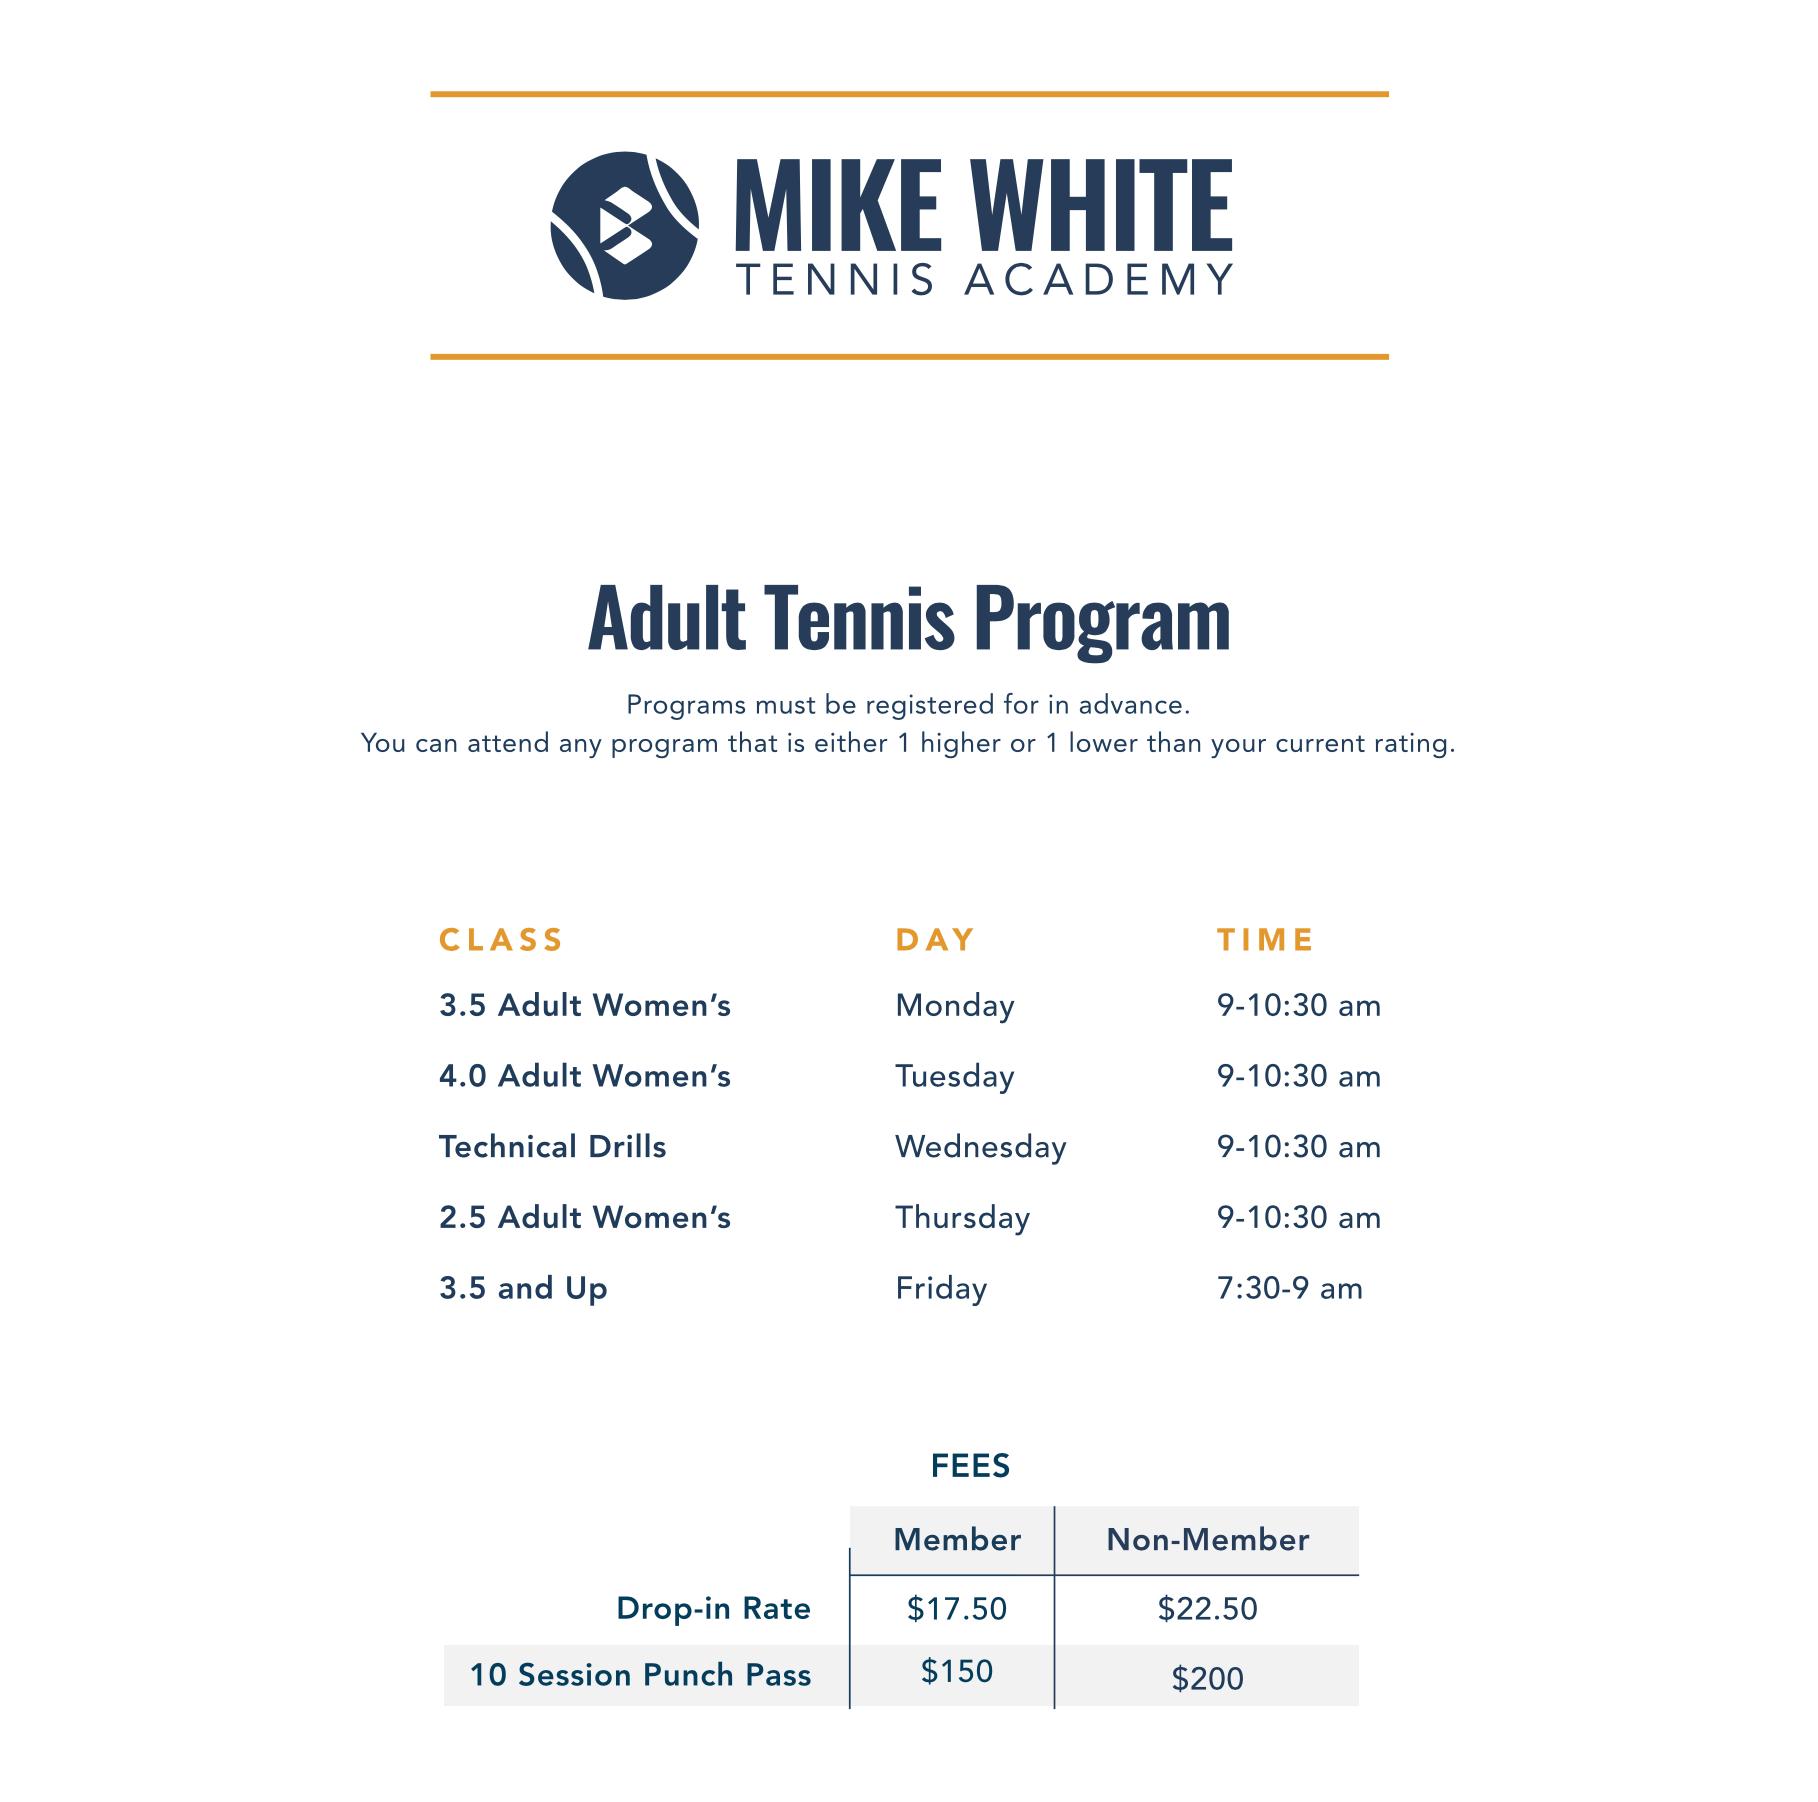 adult-tennis-program.png